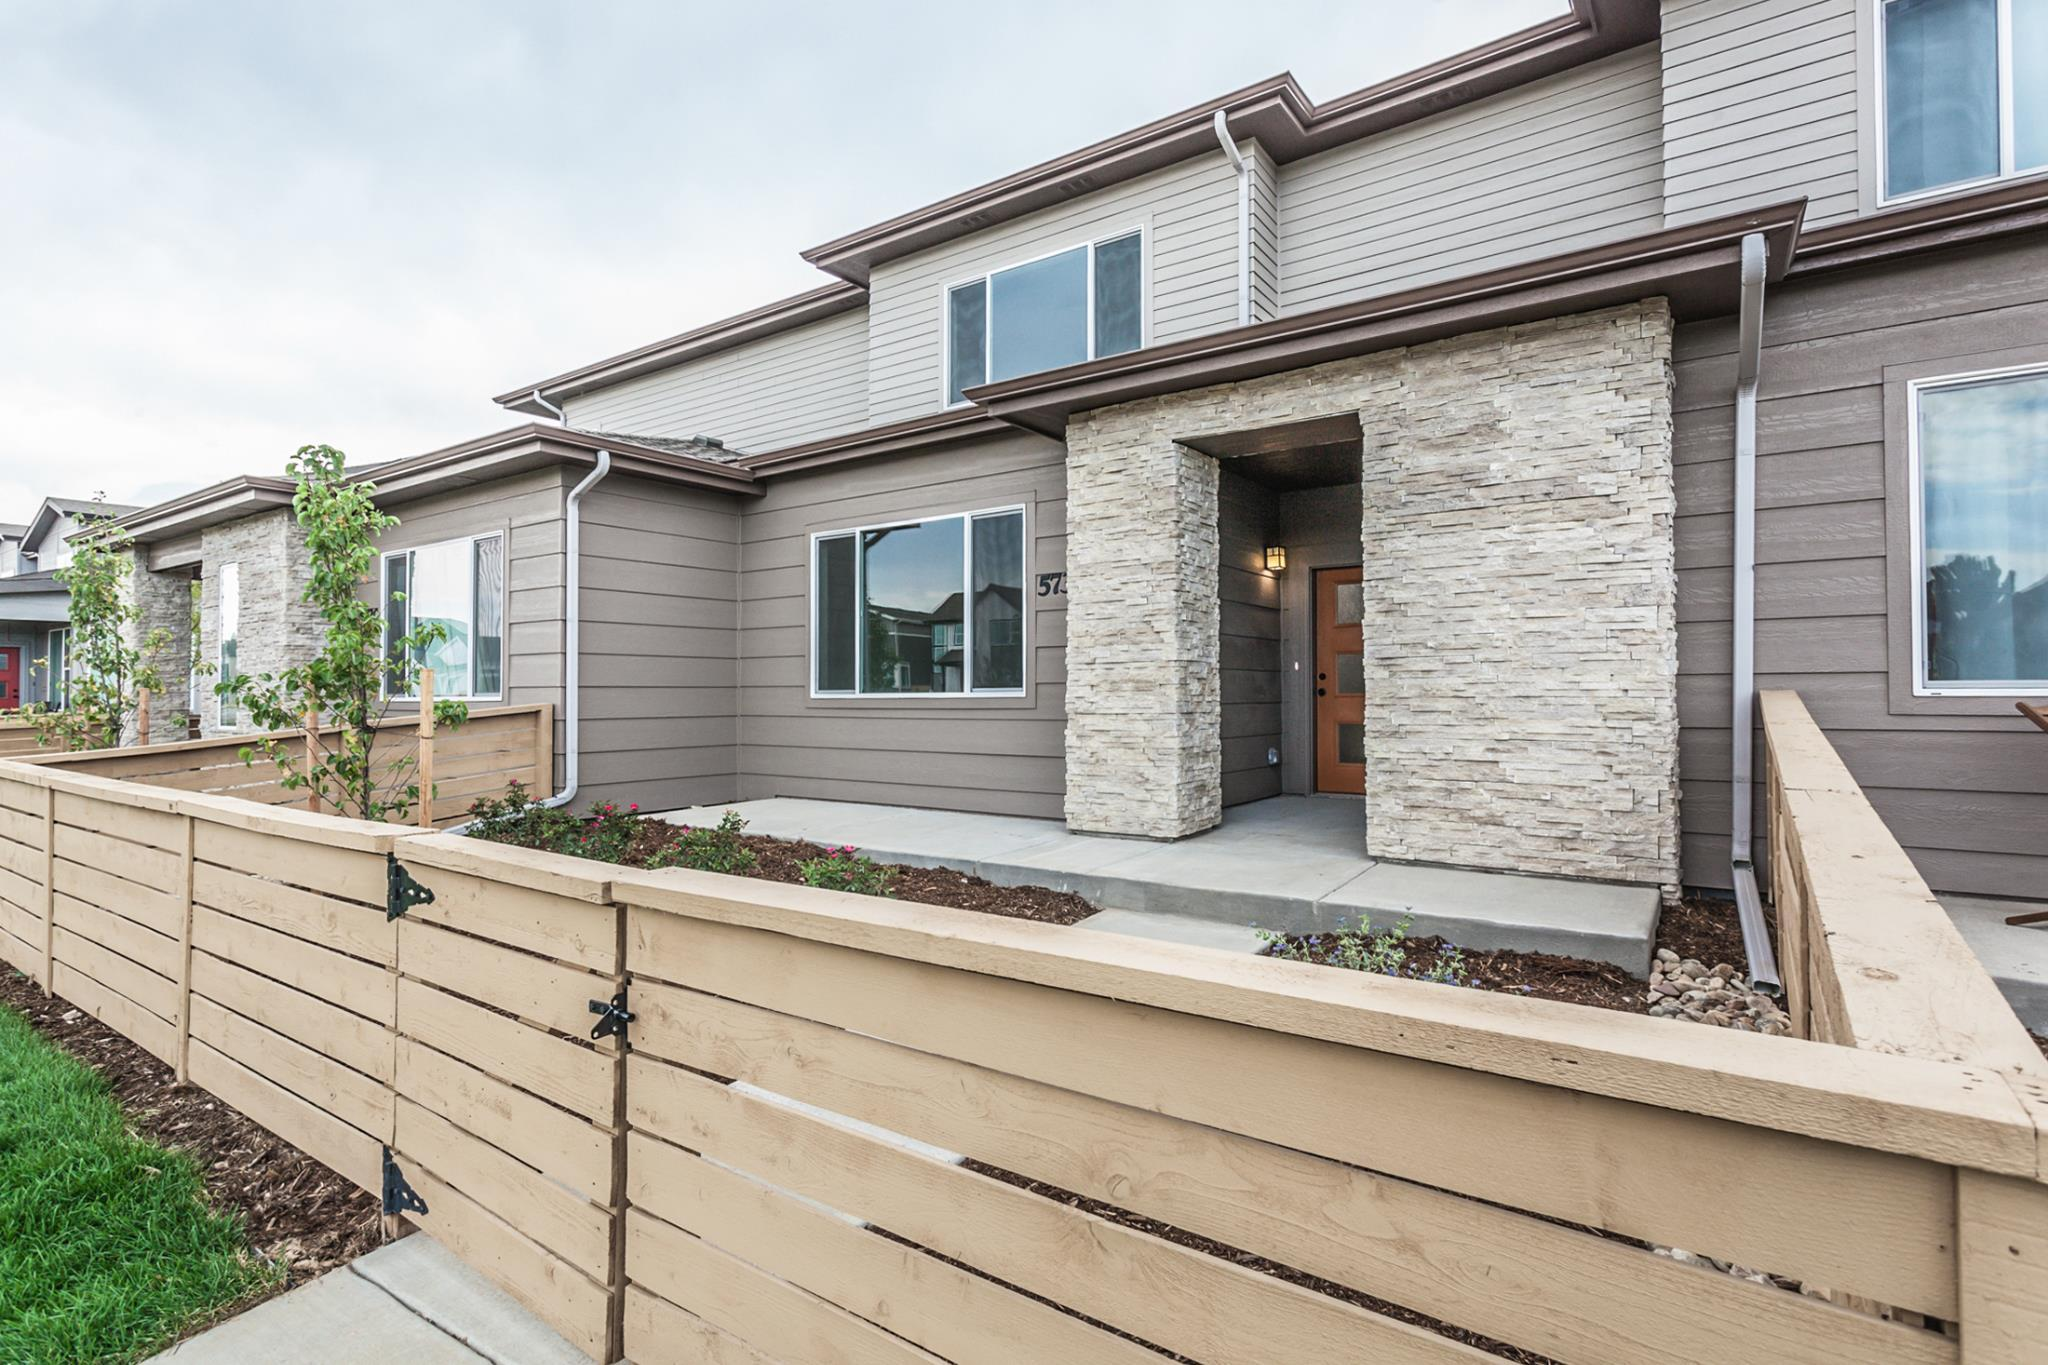 'Hartford Homes at Trailside Townhomes' by Hartford Homes in Fort Collins-Loveland